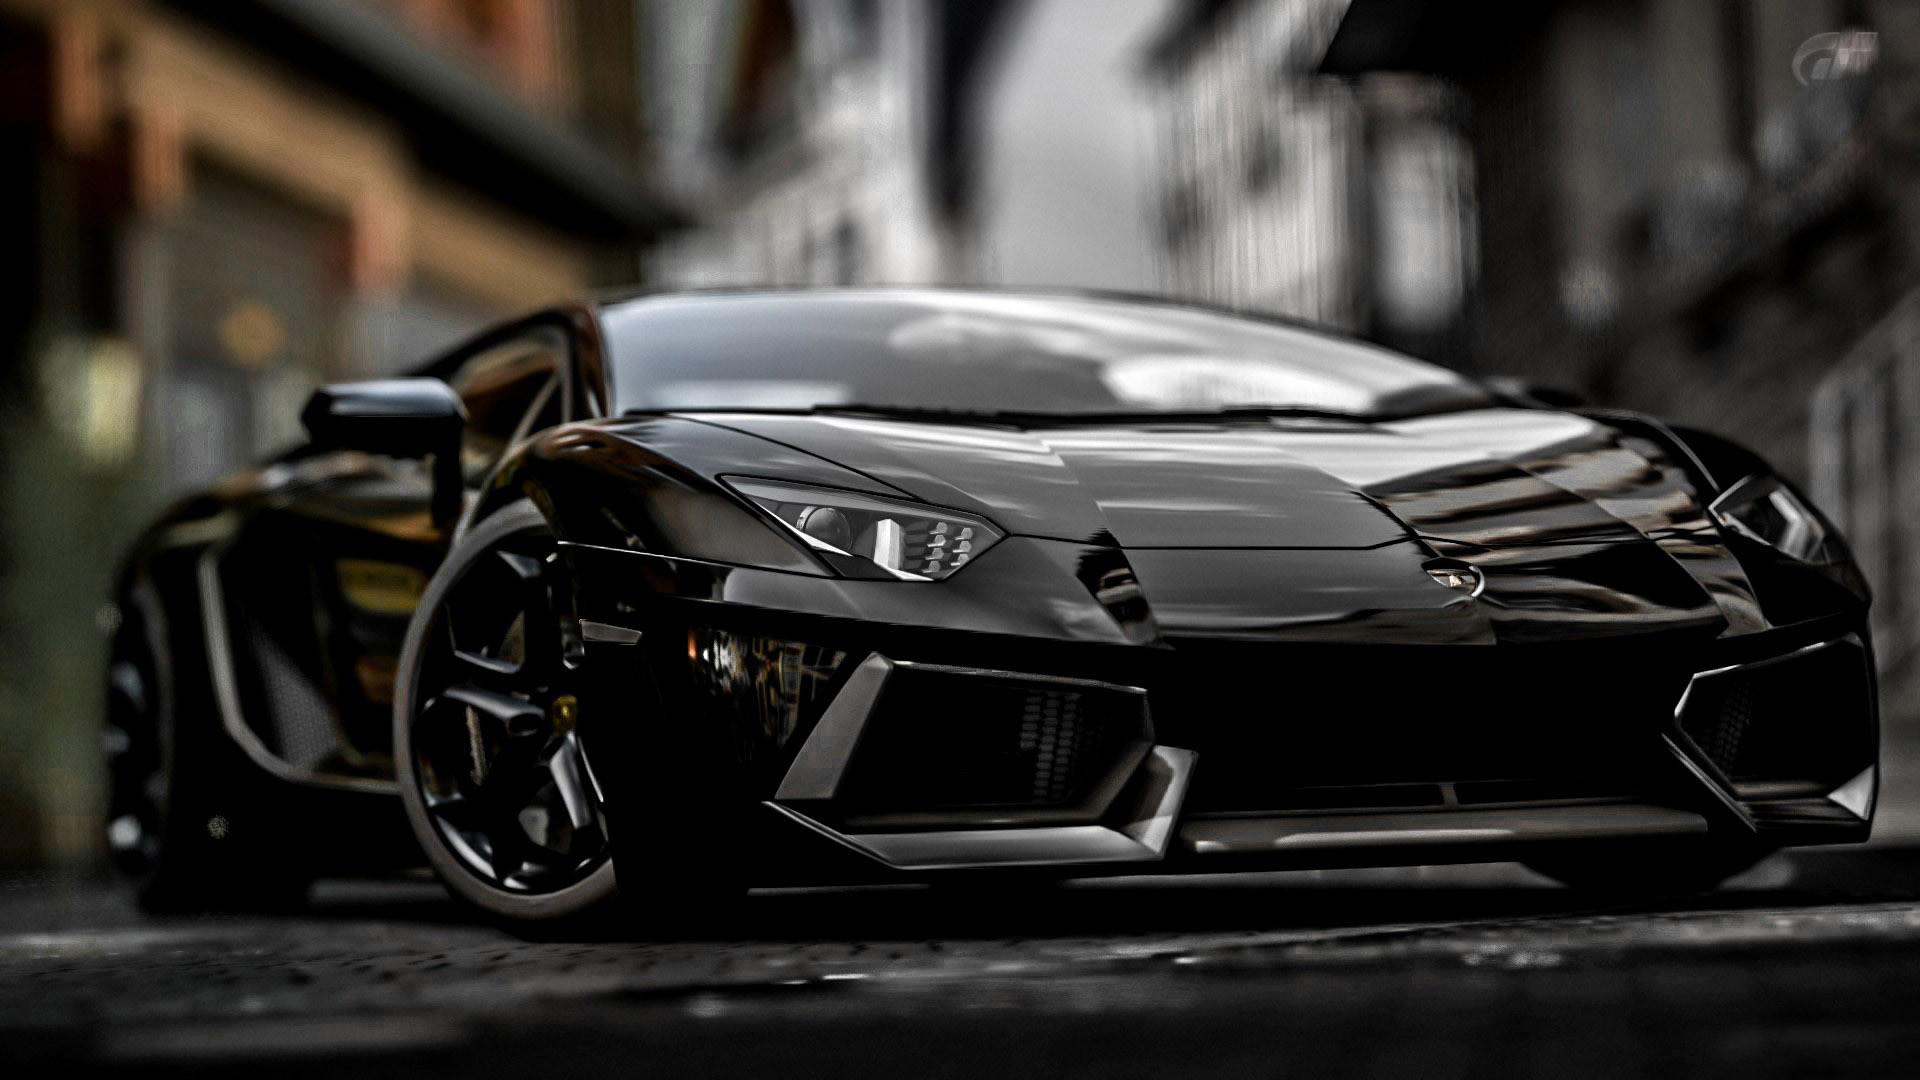 Lamborghini 4k Wallpaper Posted By Ryan Cunningham